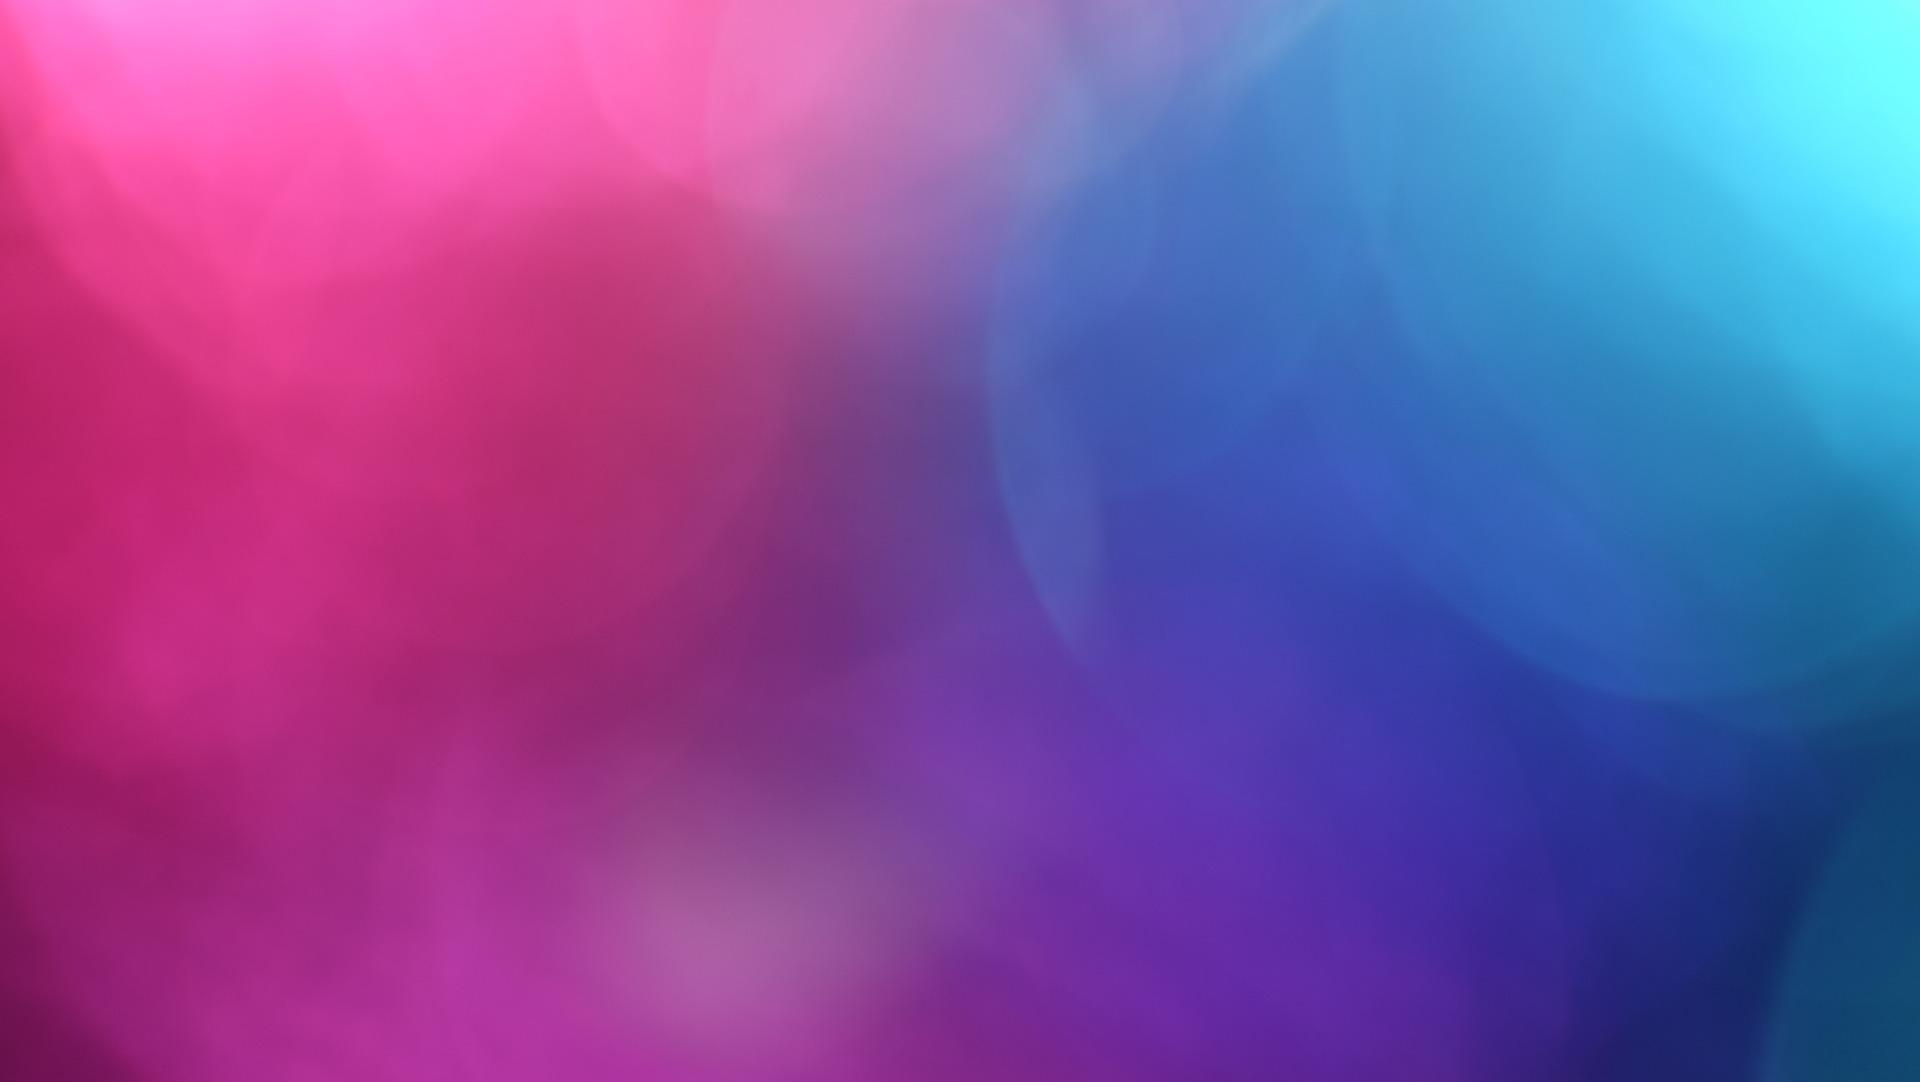 pink-1121216_1920.png